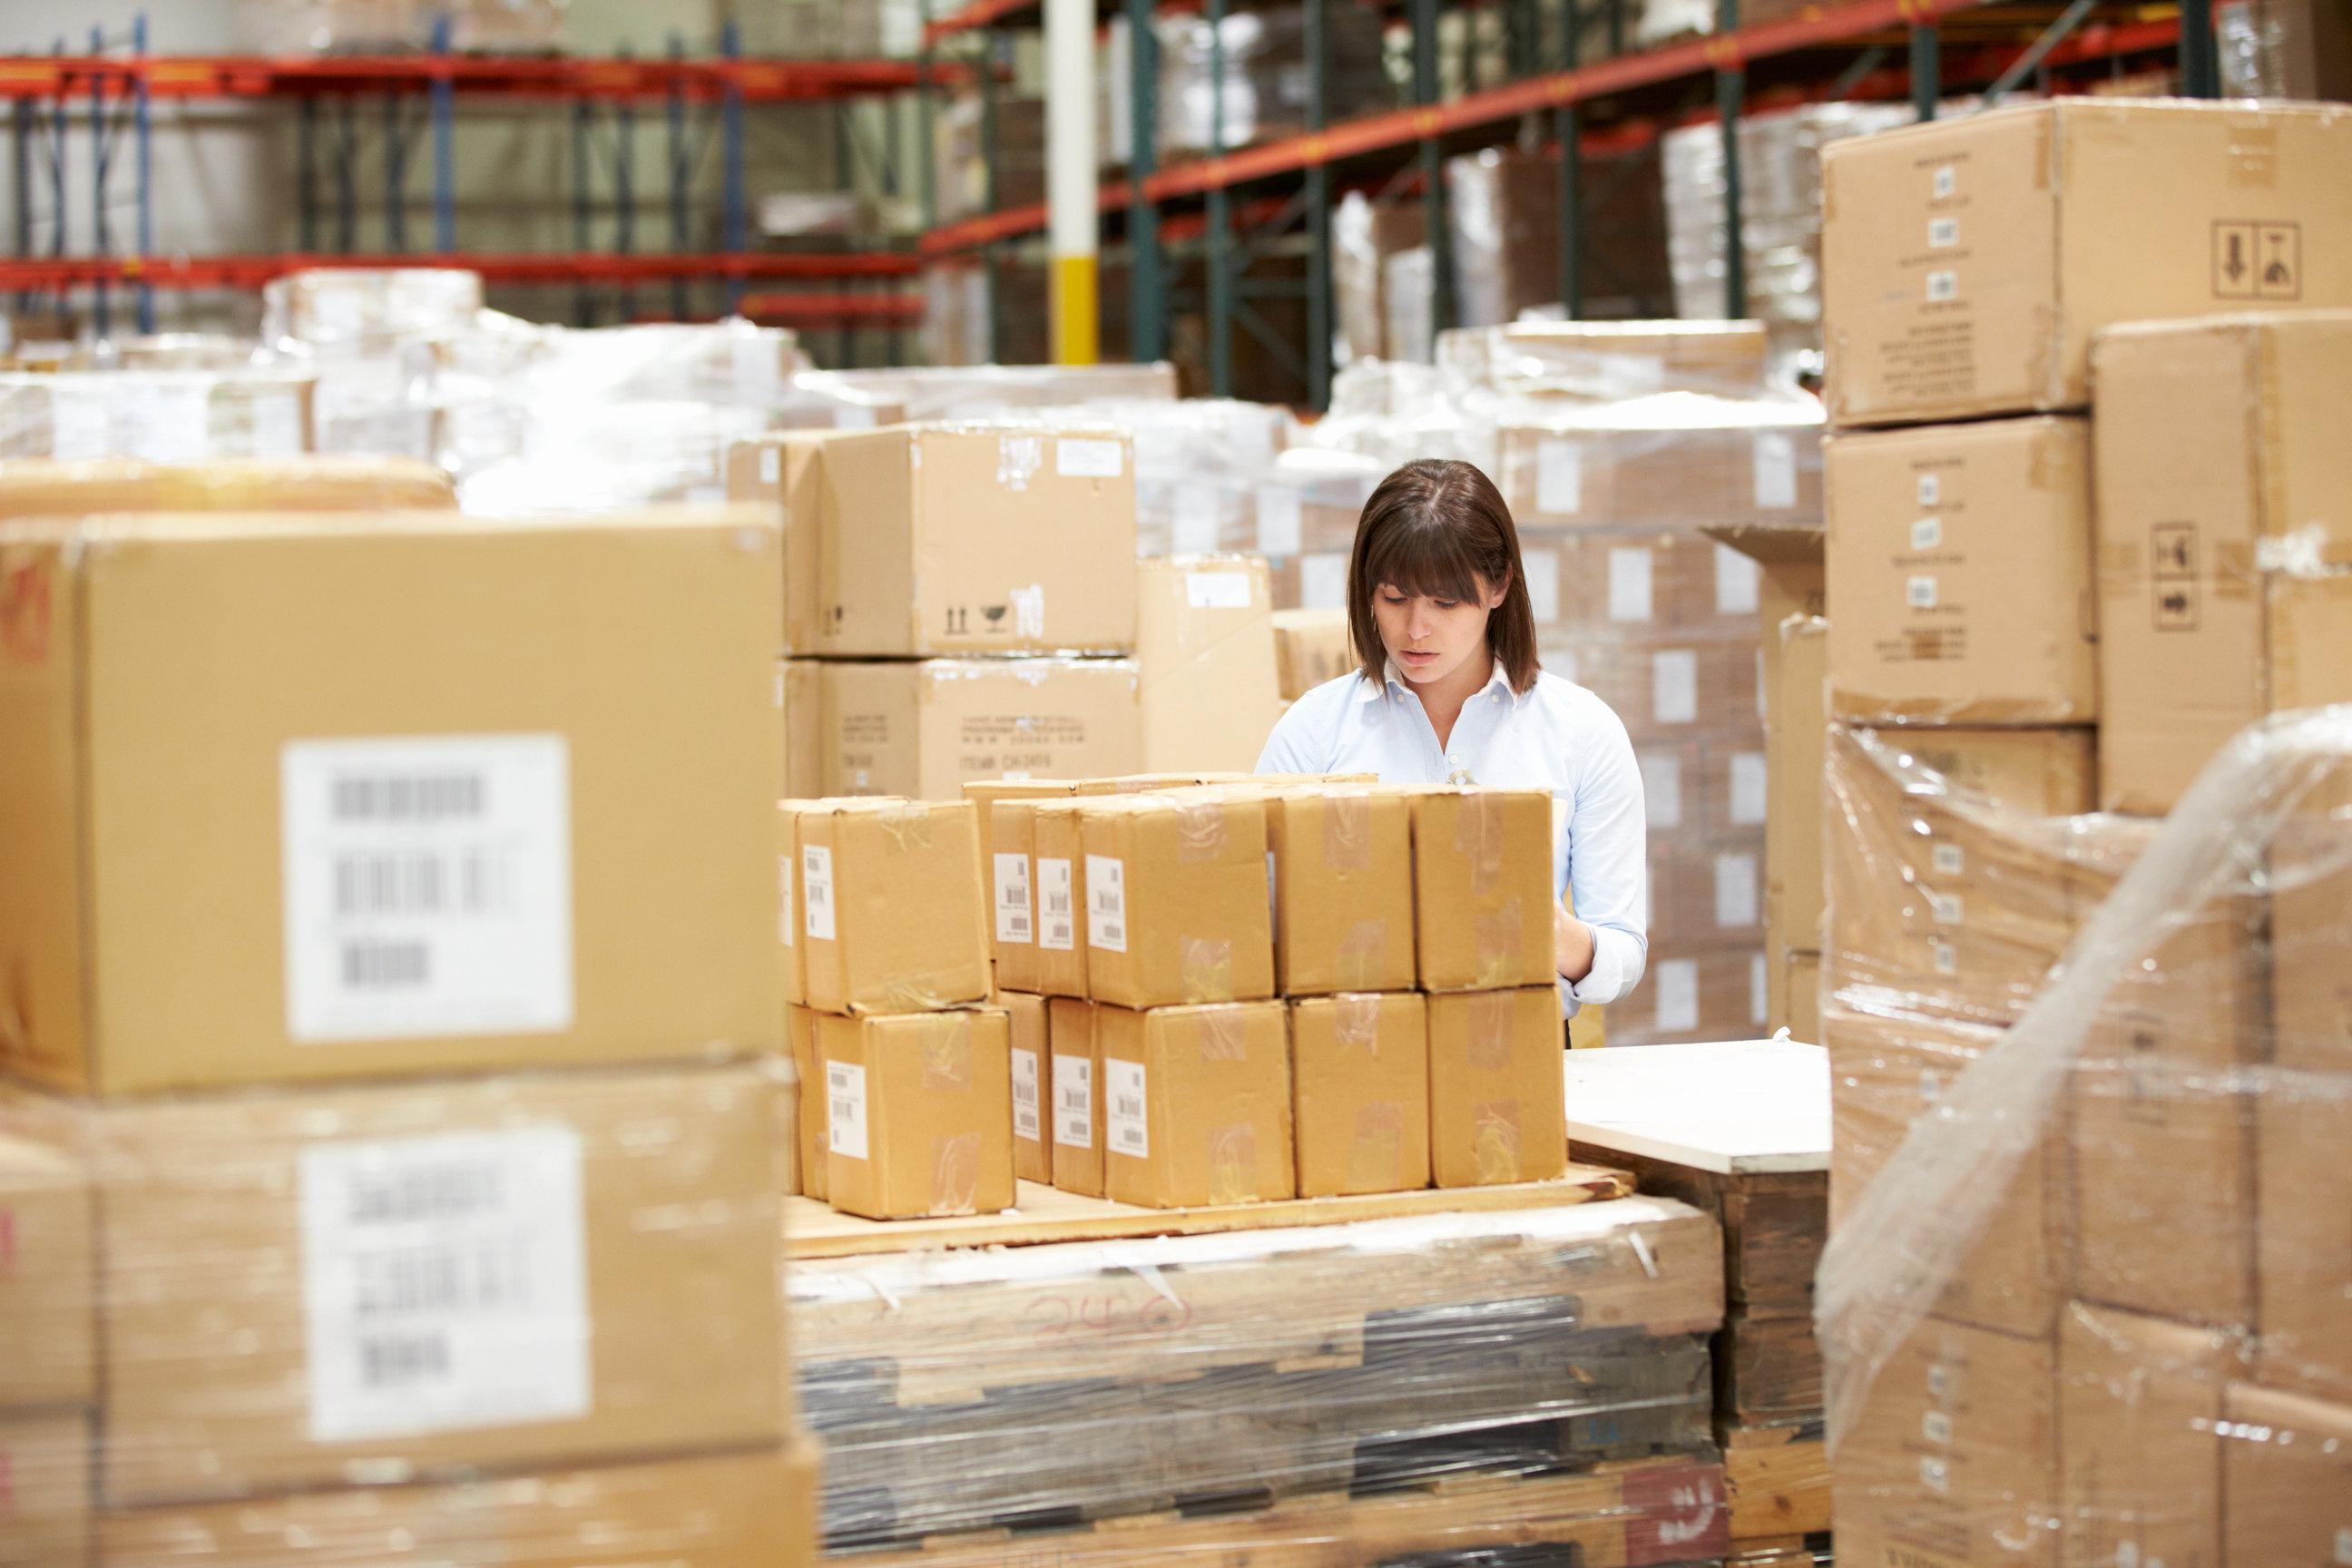 Jane Abbott – Warehouse Manager